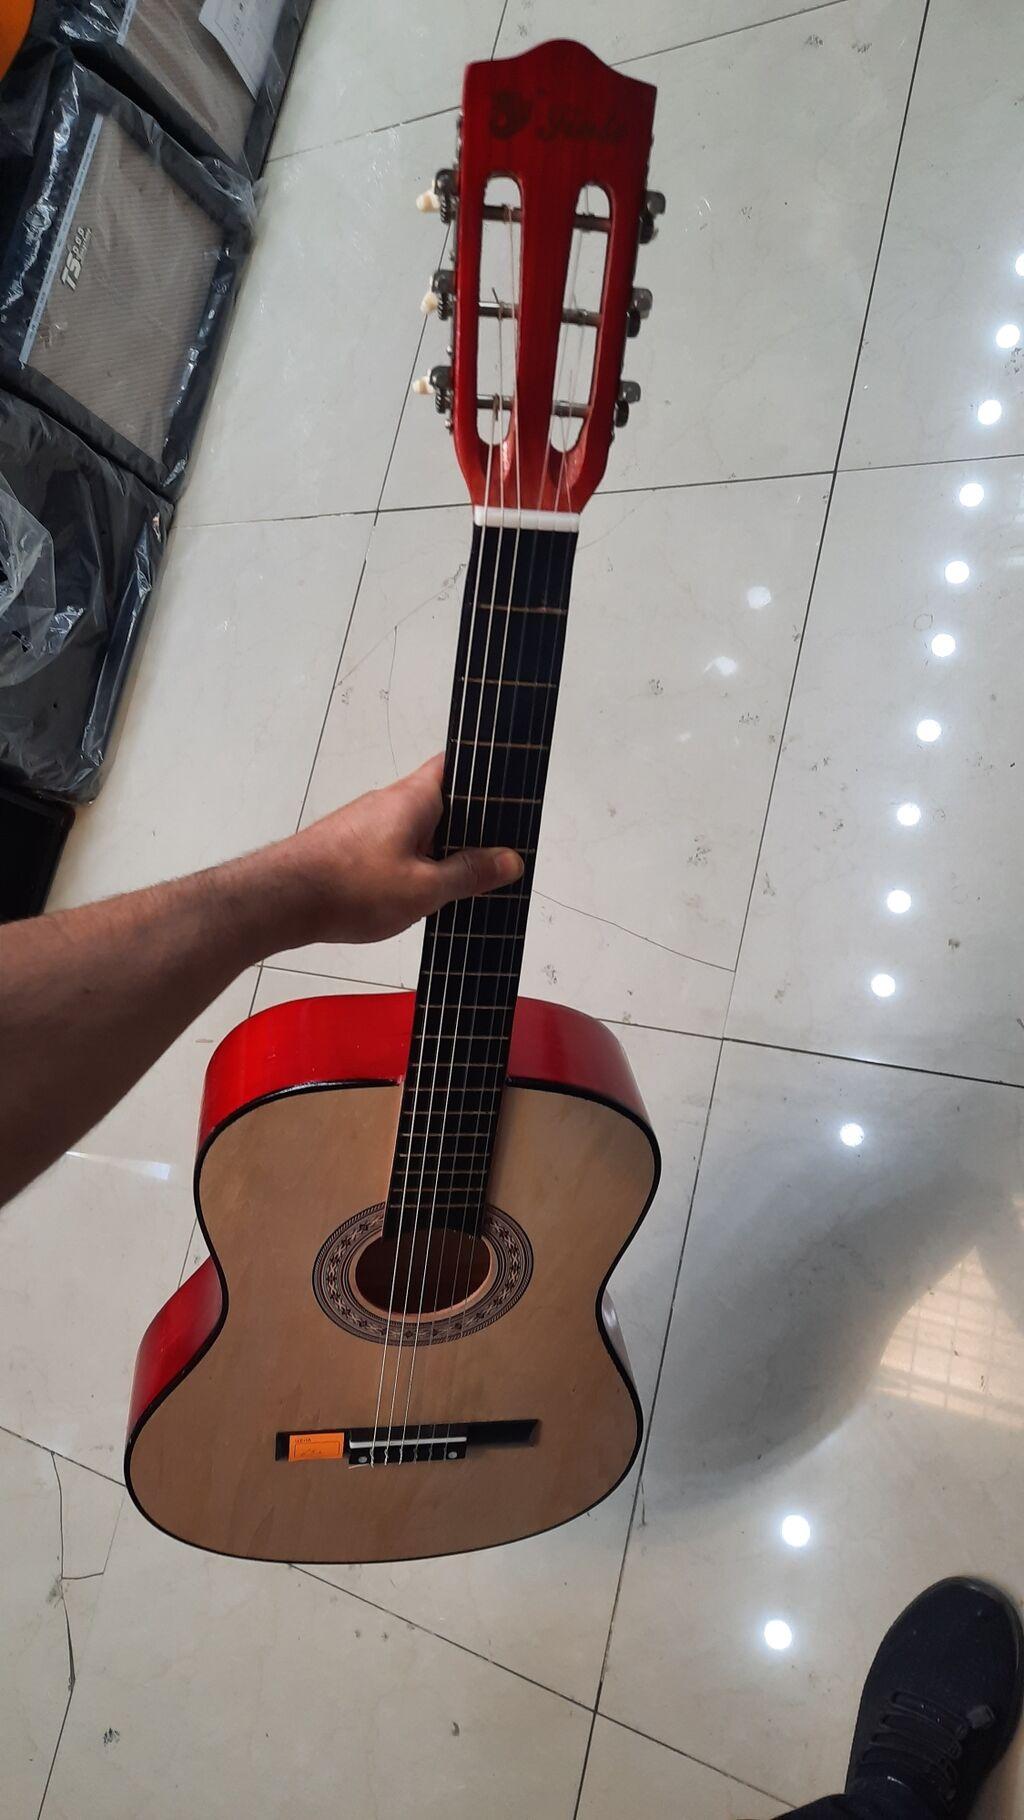 Klassik gitara teze pakofqa  Rast musiqi aletleri maģaza ùnvanalari: Klassik gitara teze pakofqa  Rast musiqi aletleri maģaza ùnvanalari